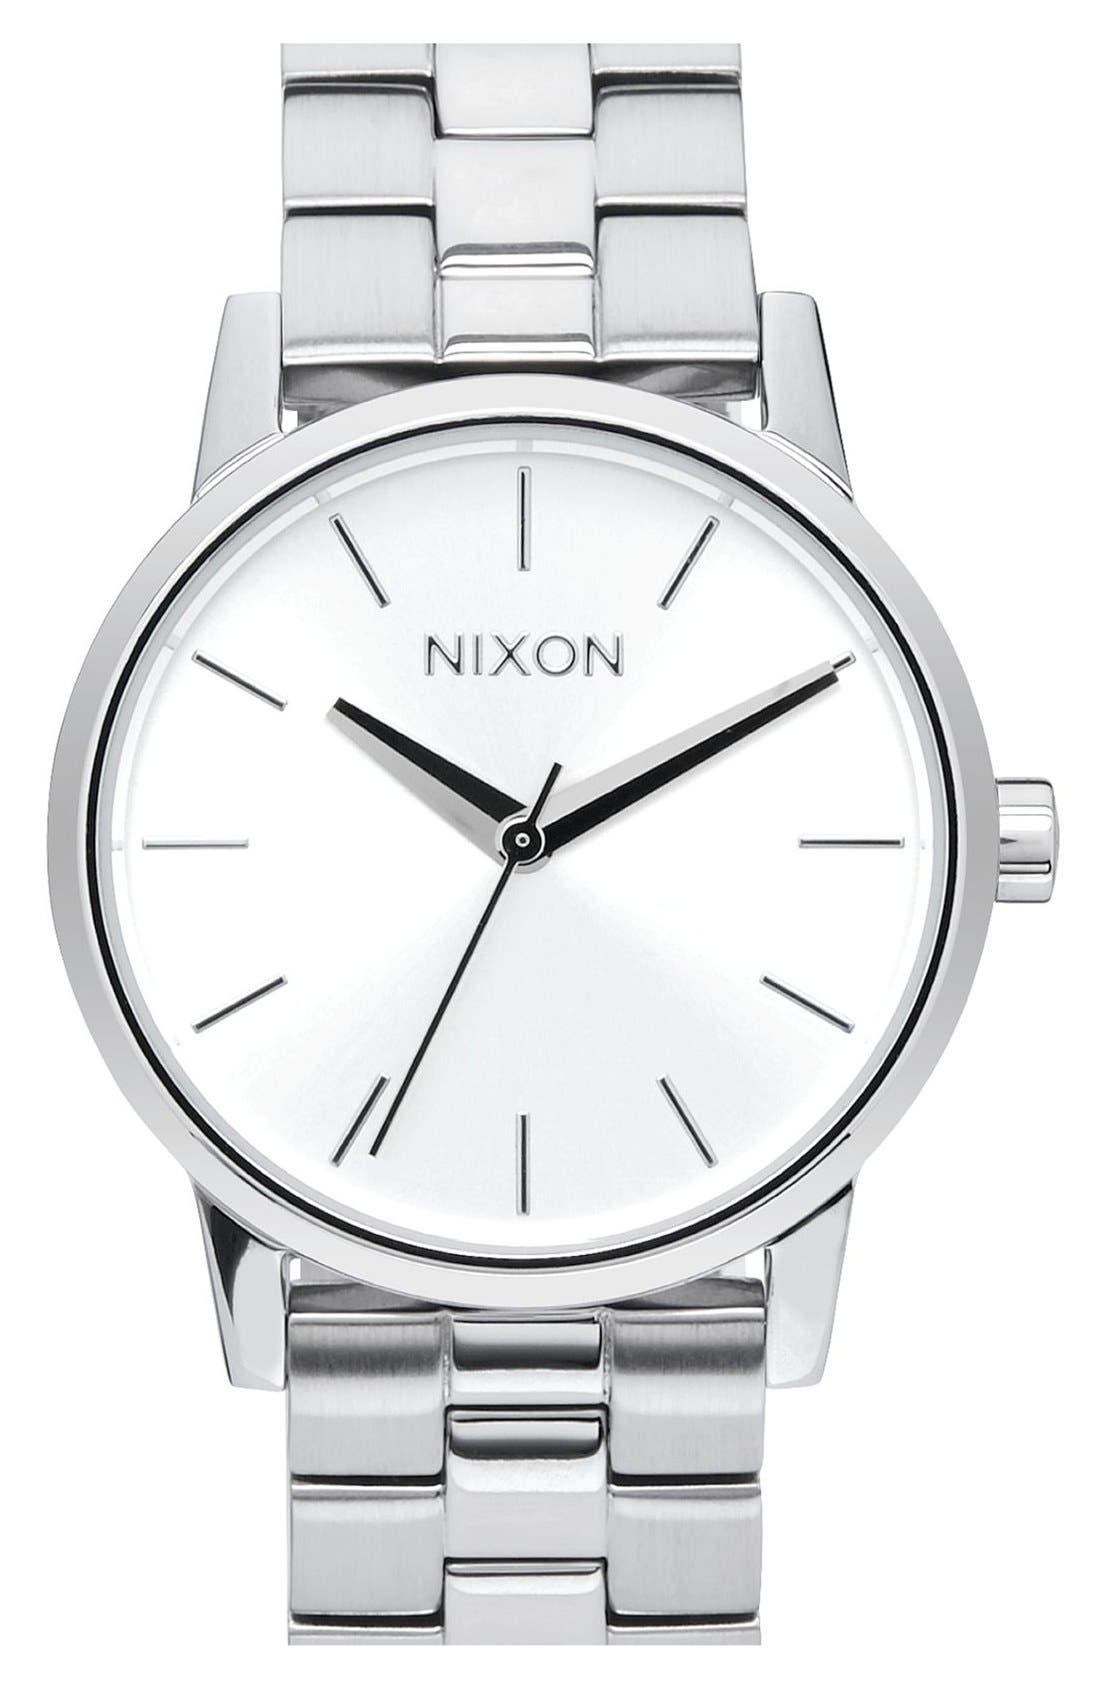 NIXON Kensington Bracelet Watch, 32mm